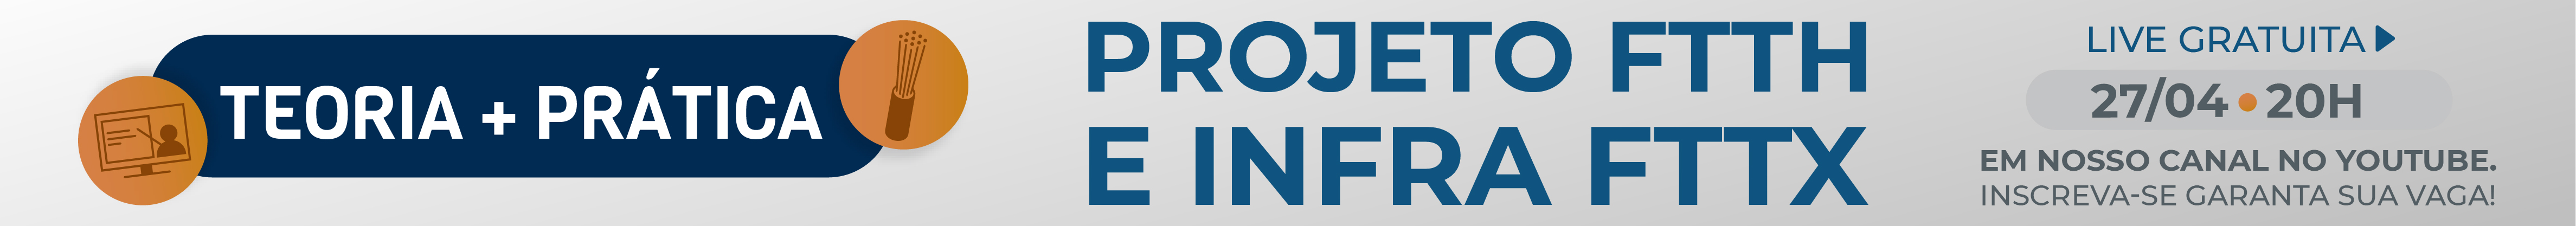 lançamento teoria + prática - projeto ftth e infra fttx